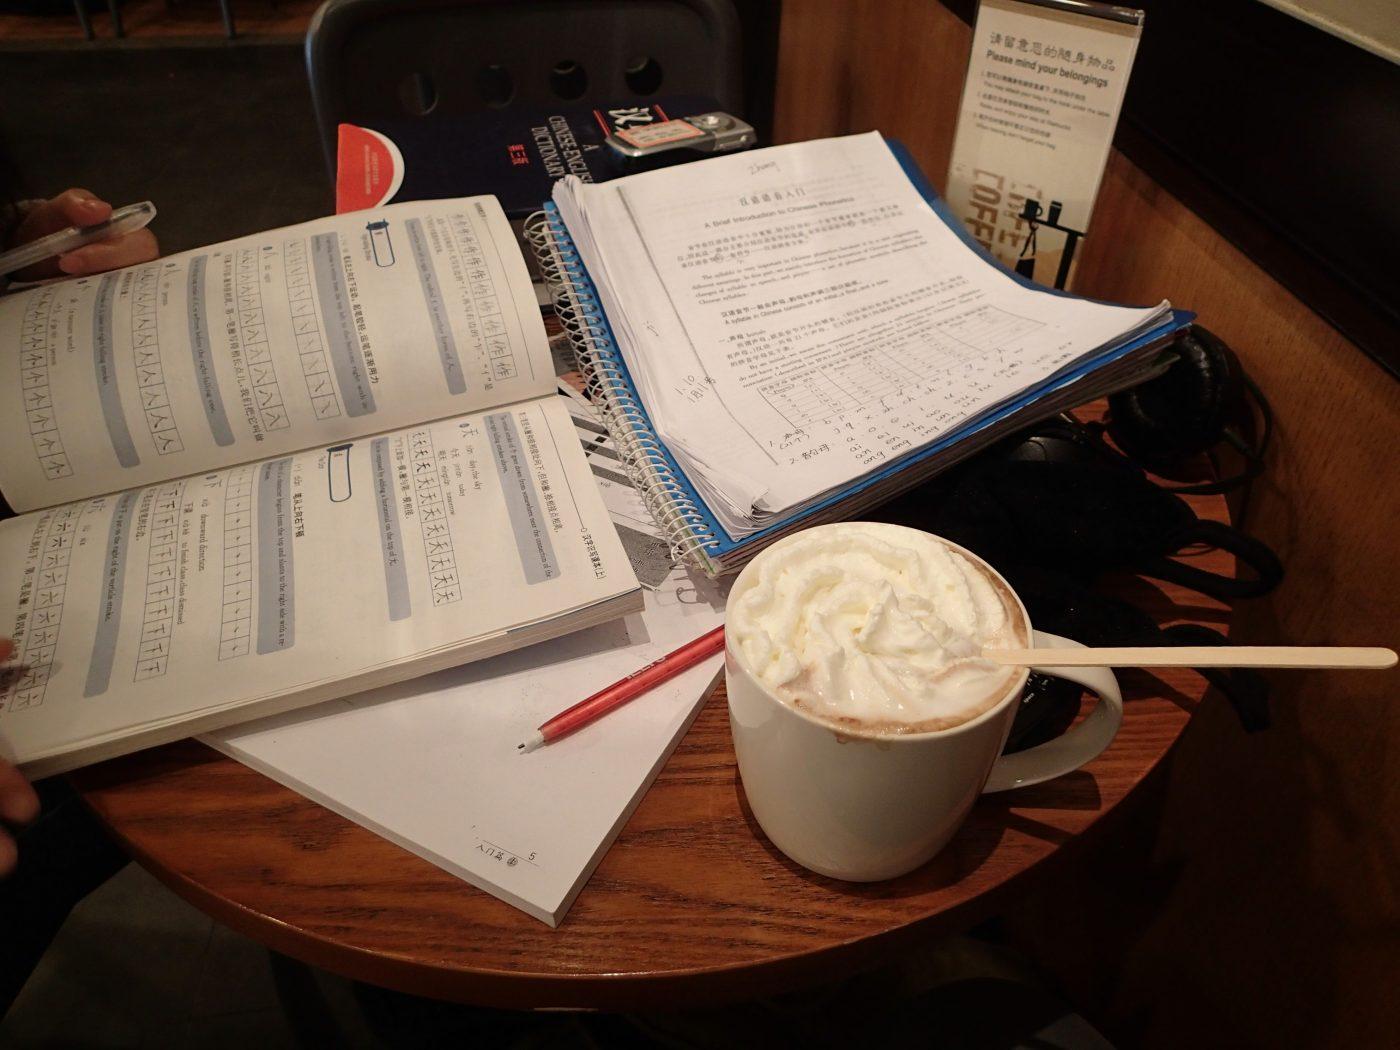 study books and starbucks coffee